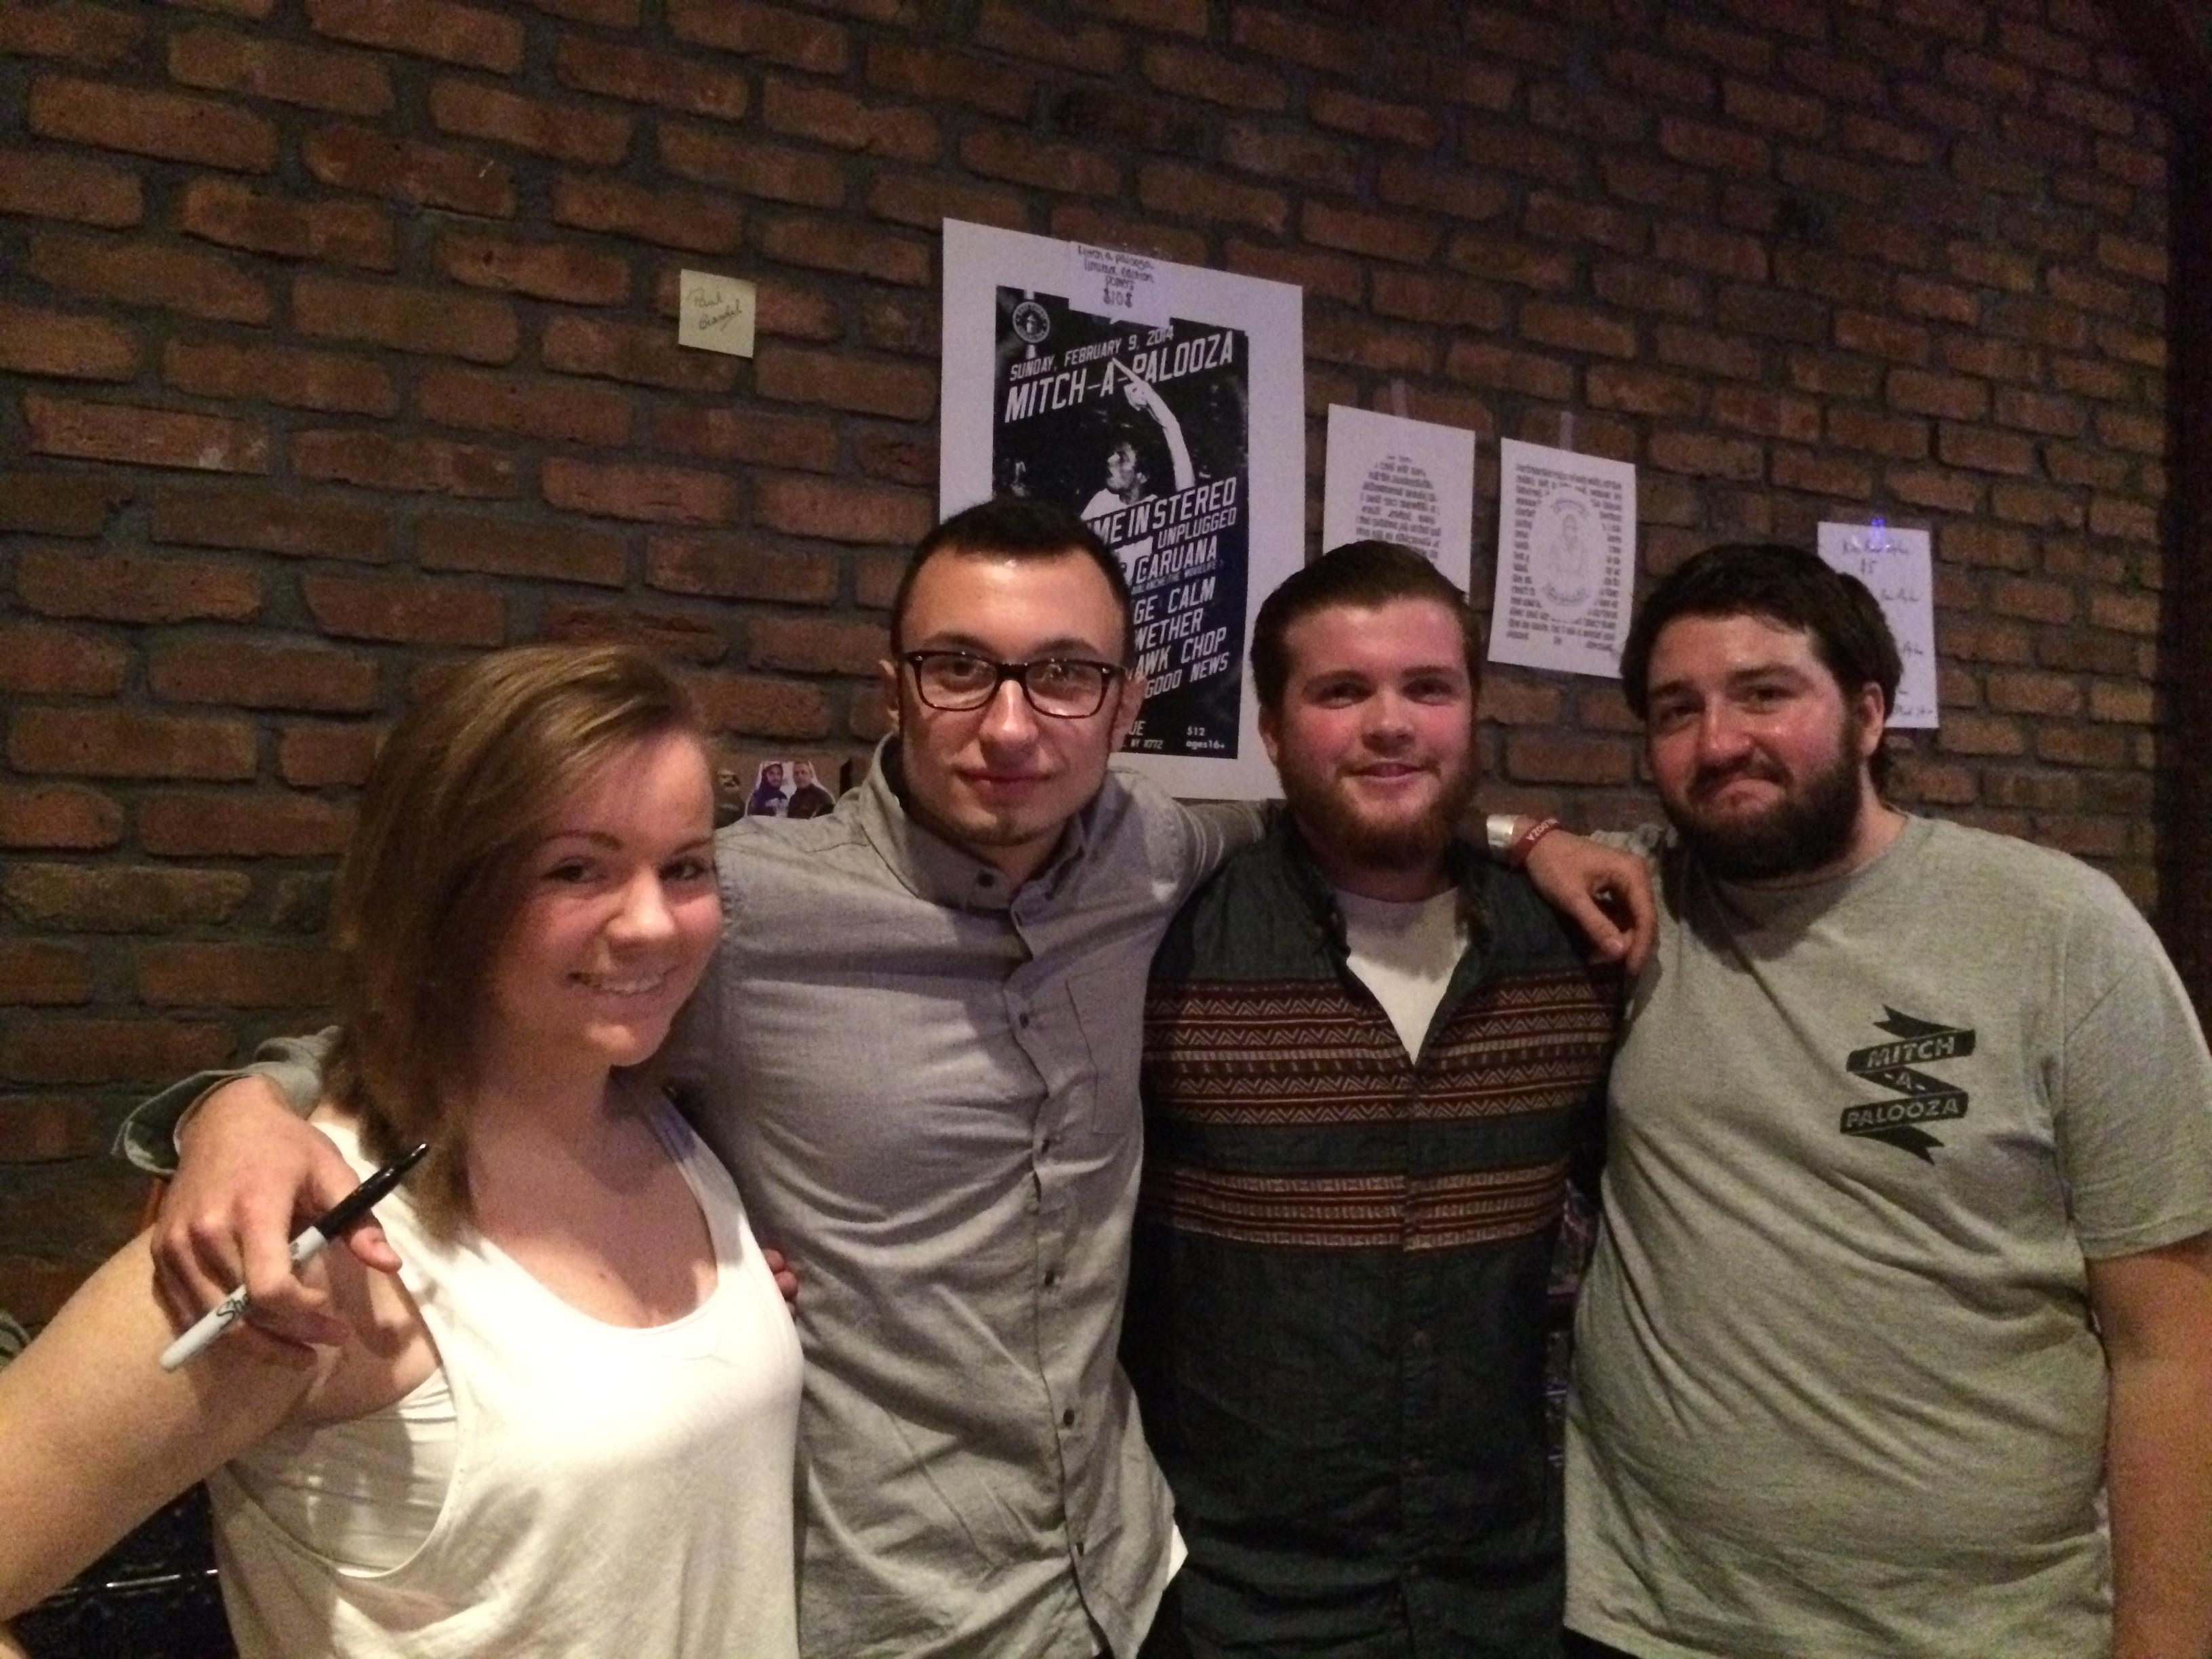 (Left to Right:) Lauren Pardo, Nick Amalfitano, Paul Brandel, and Dylan McGovern.  (Photo Credit: Christa Speranza)